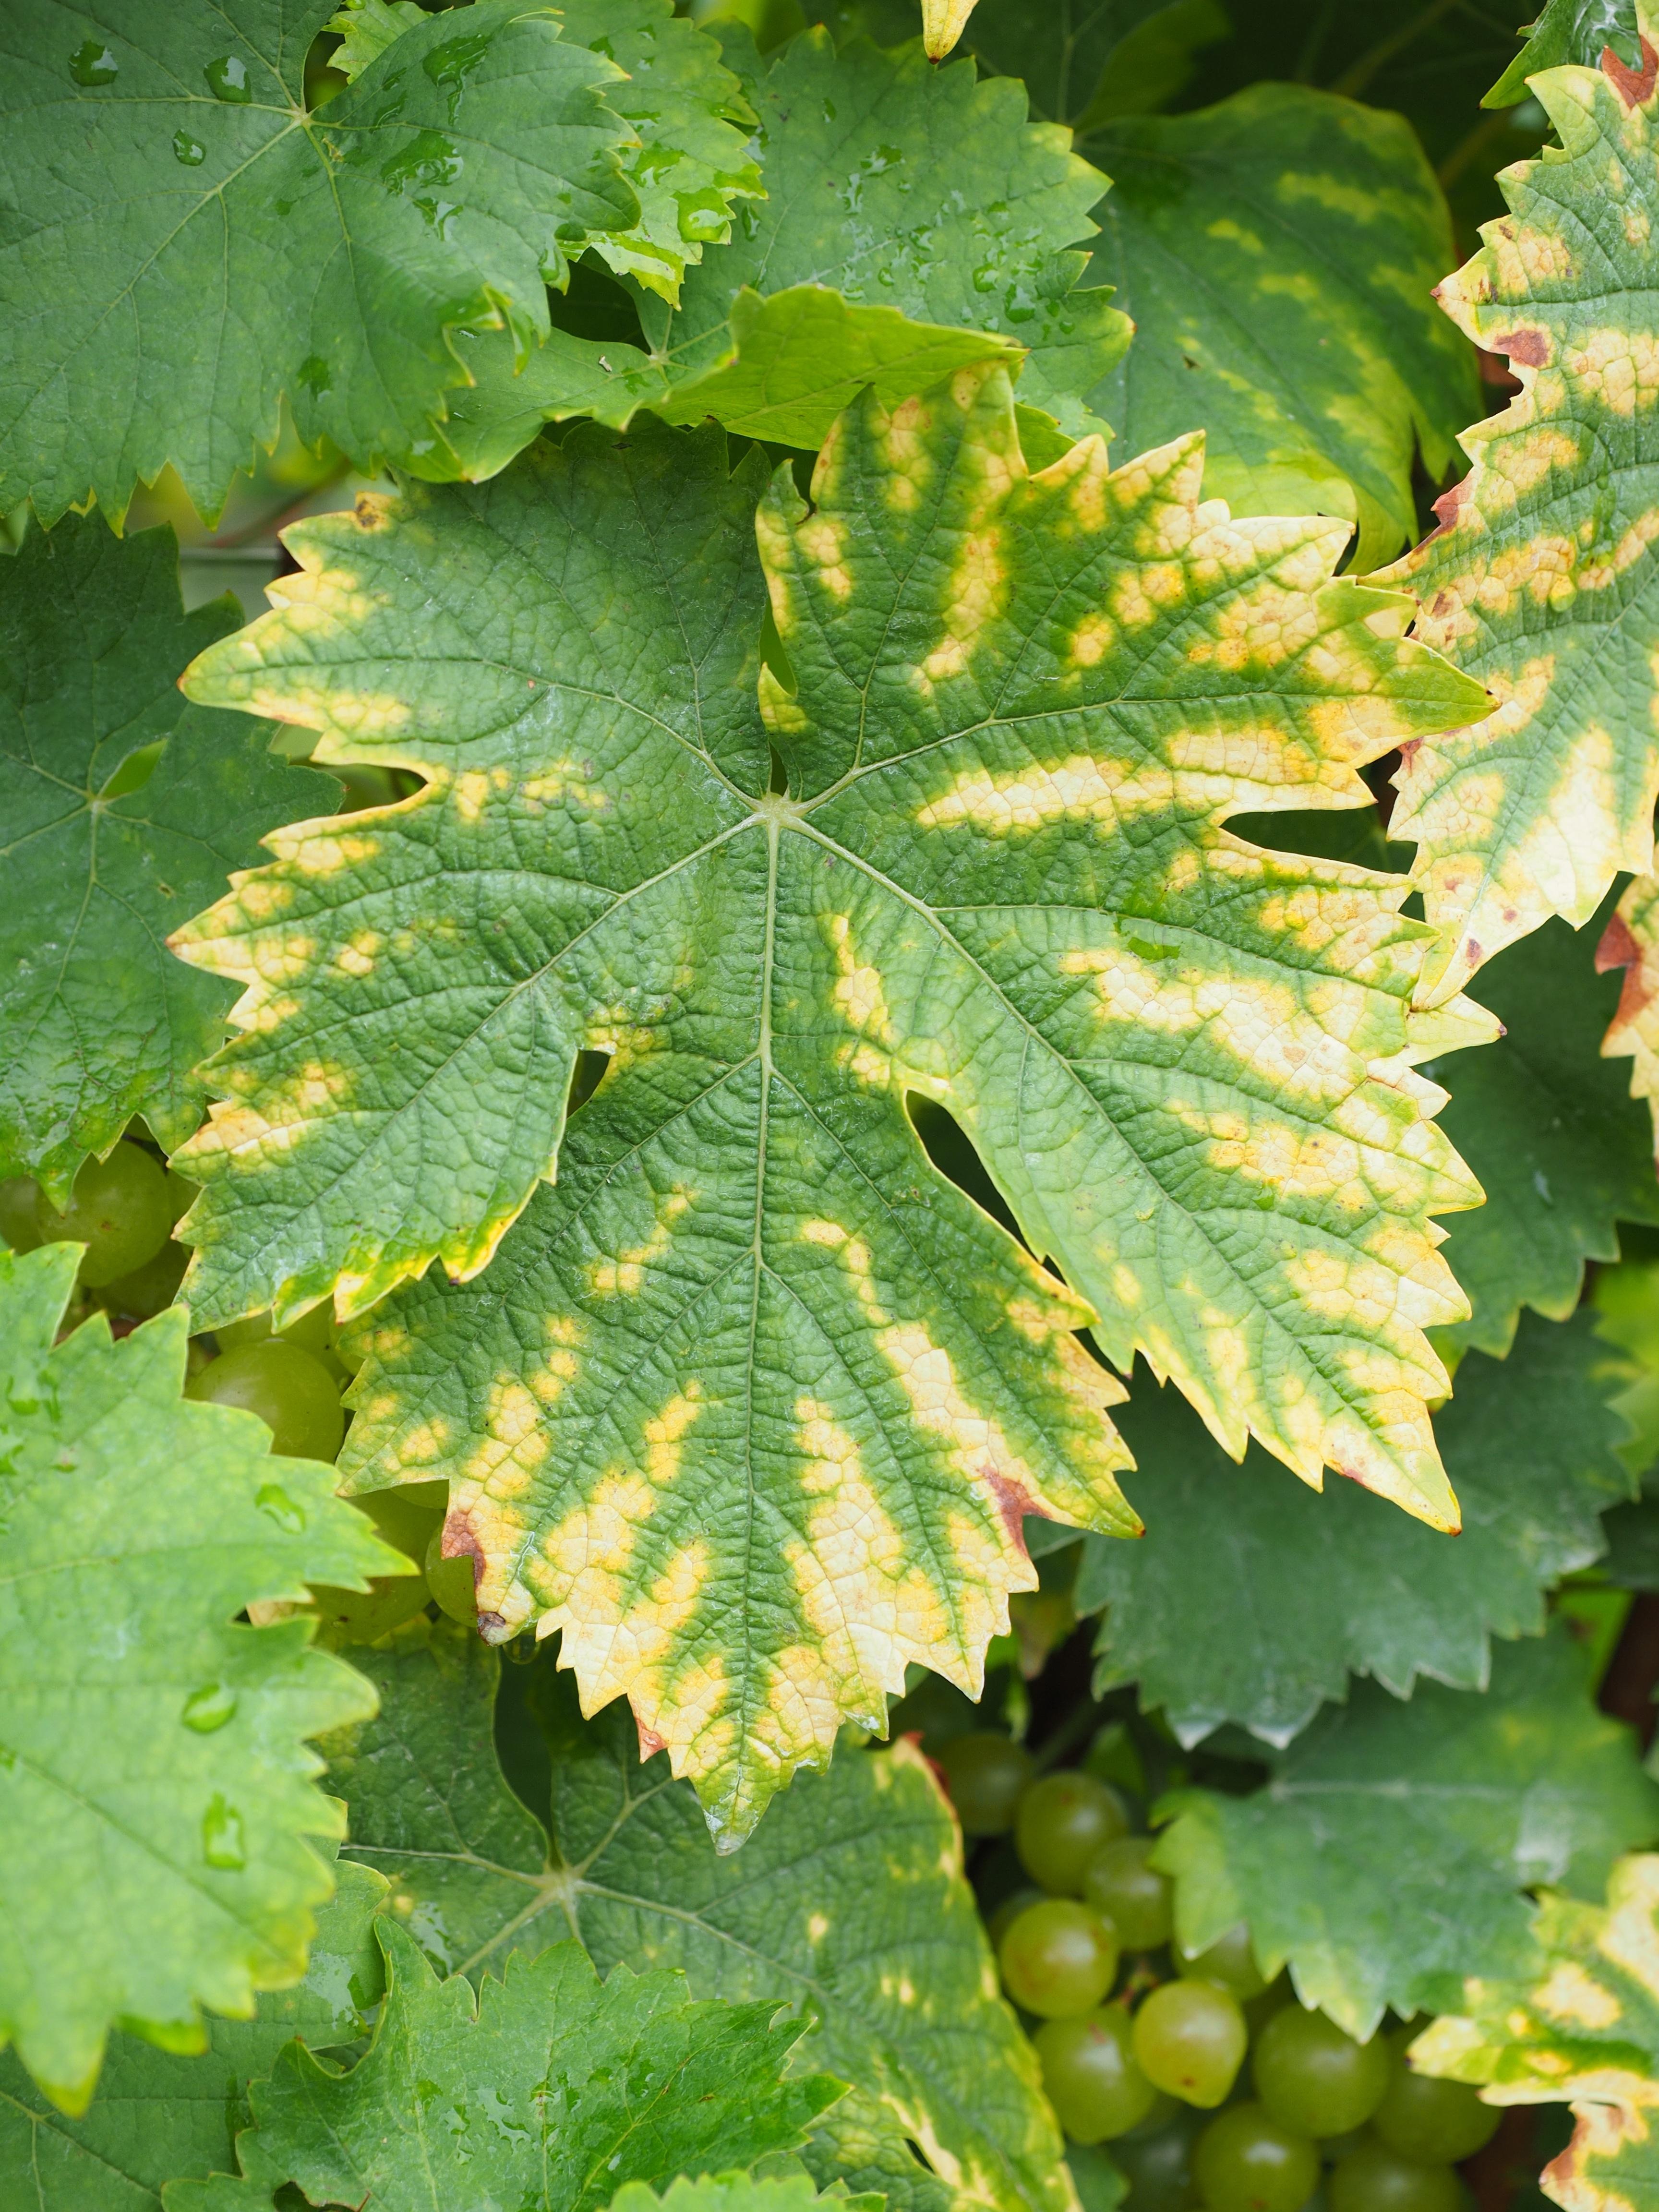 Gambar Menanam Buah Bunga Makanan Hijau Menghasilkan Musim